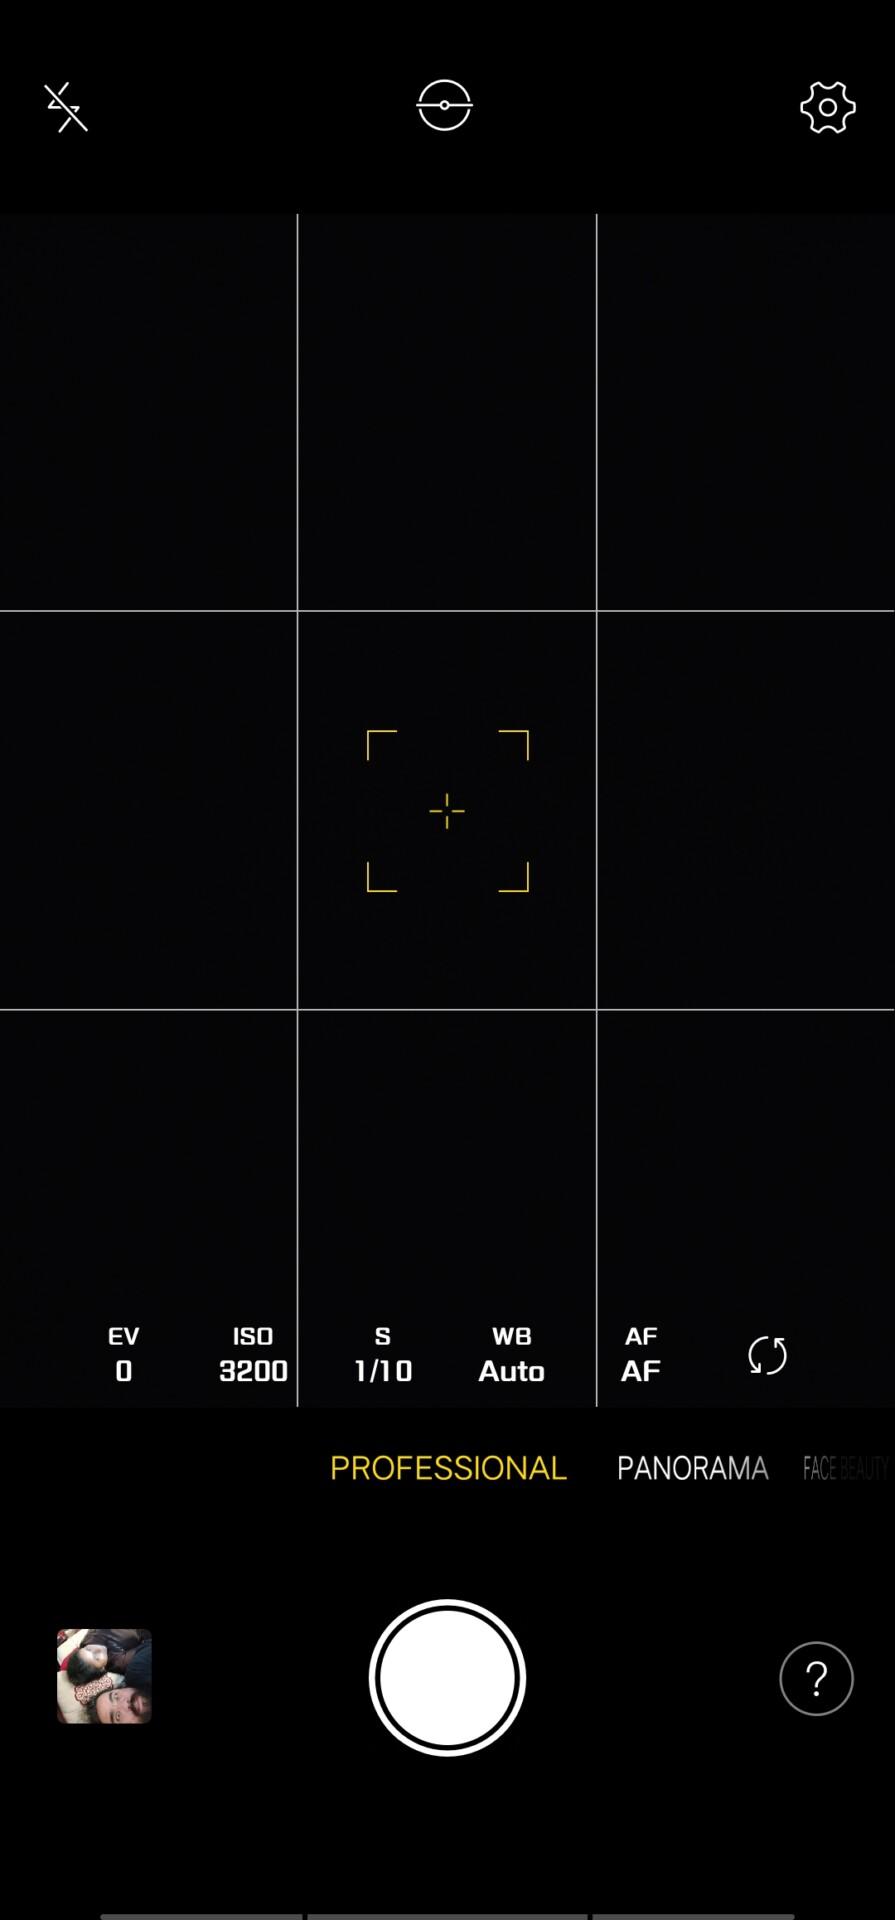 Vivo Nex S default professional screen